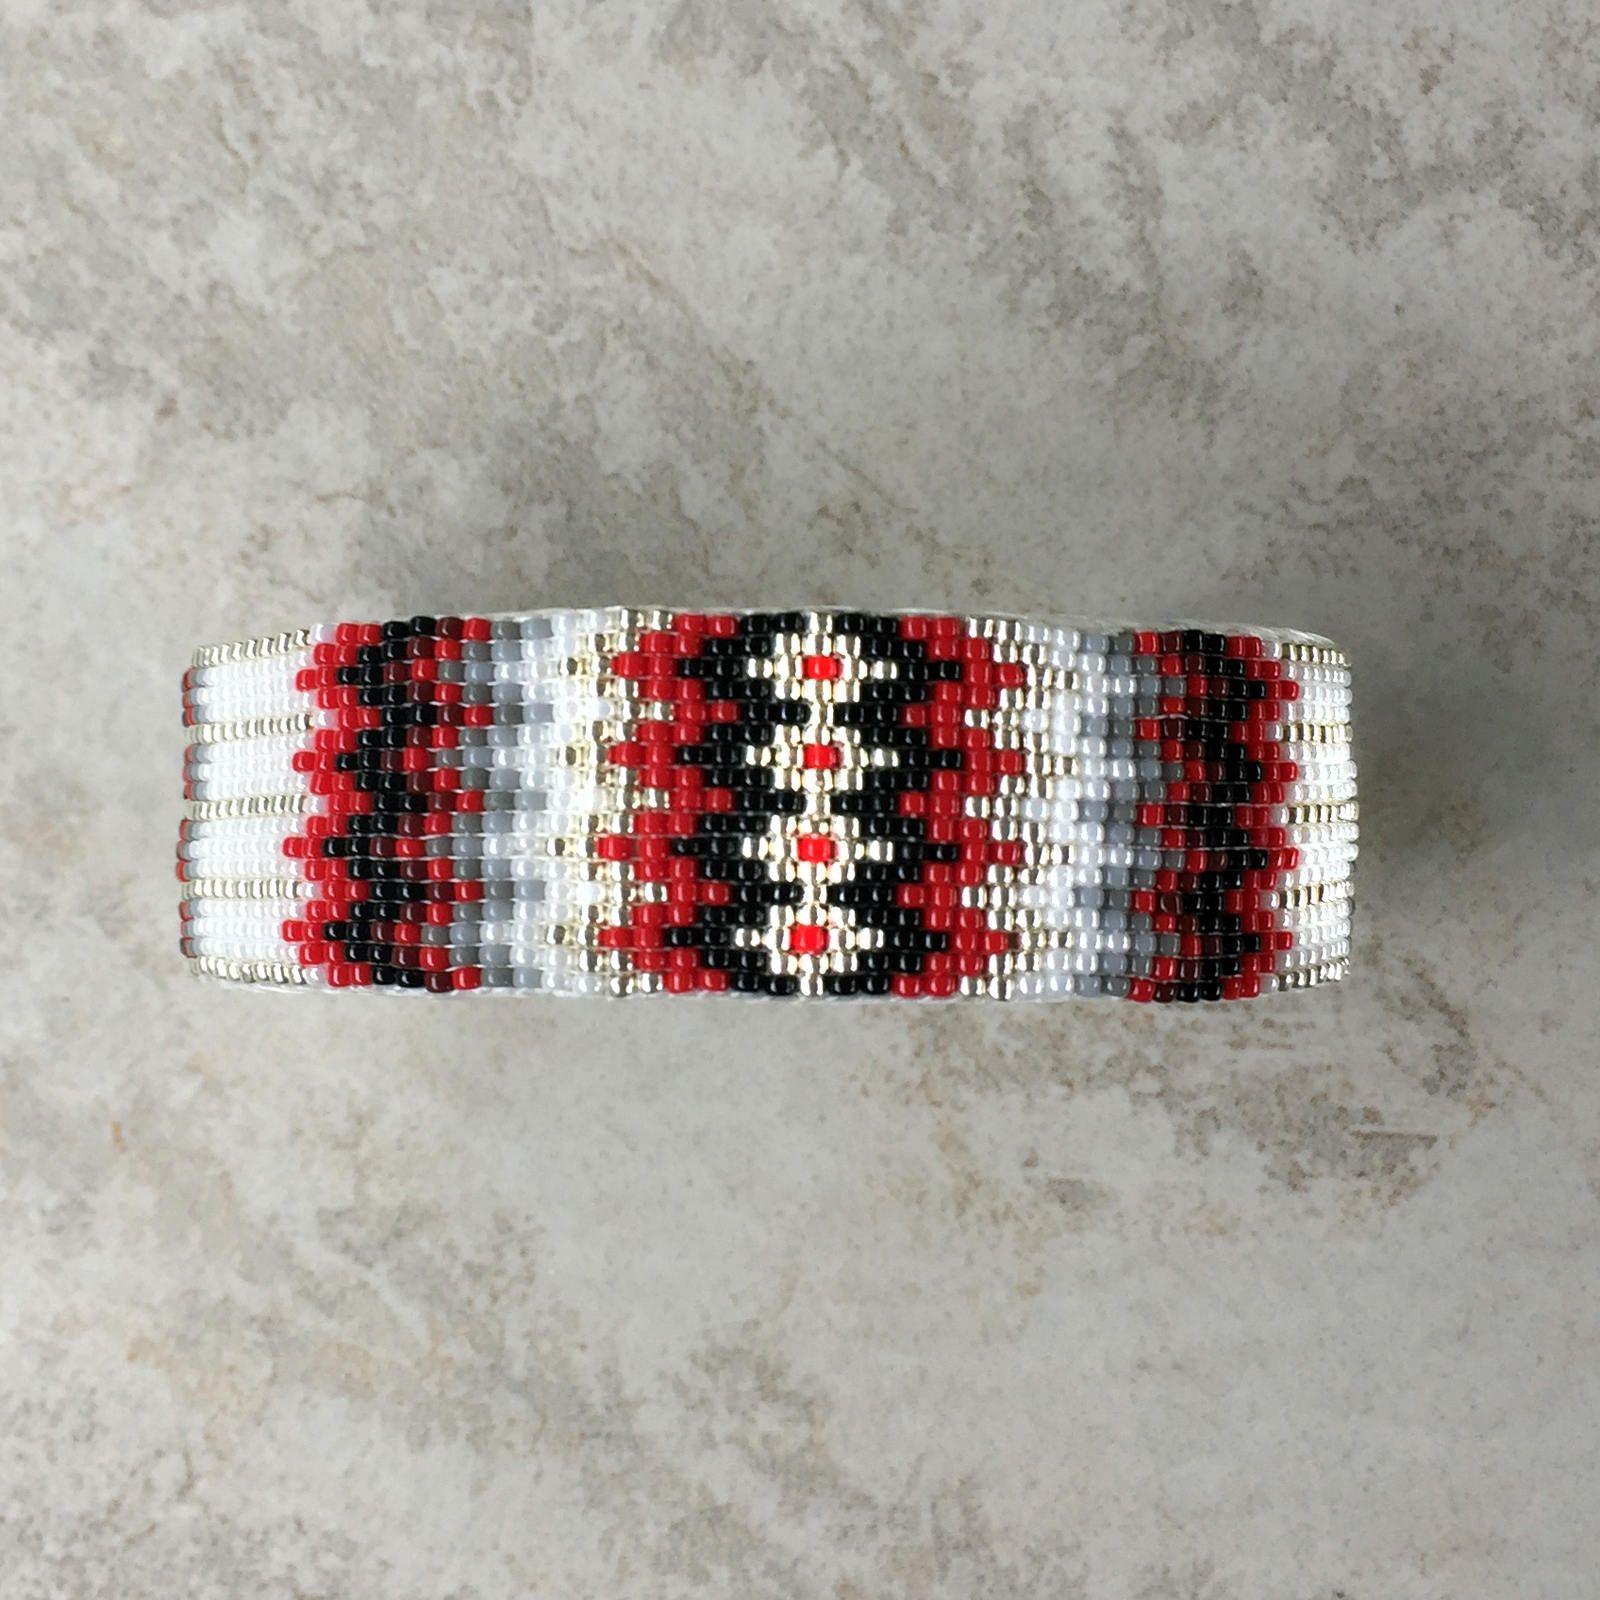 navajo bead designs. Beaded Bracelet,Navajo Jewelry,Native American Bracelet,navajo Beads, Navajo,native Jewelry,Beaded Navajo Cuff Bracelet,RED \u0026 BLACK Bead Designs B